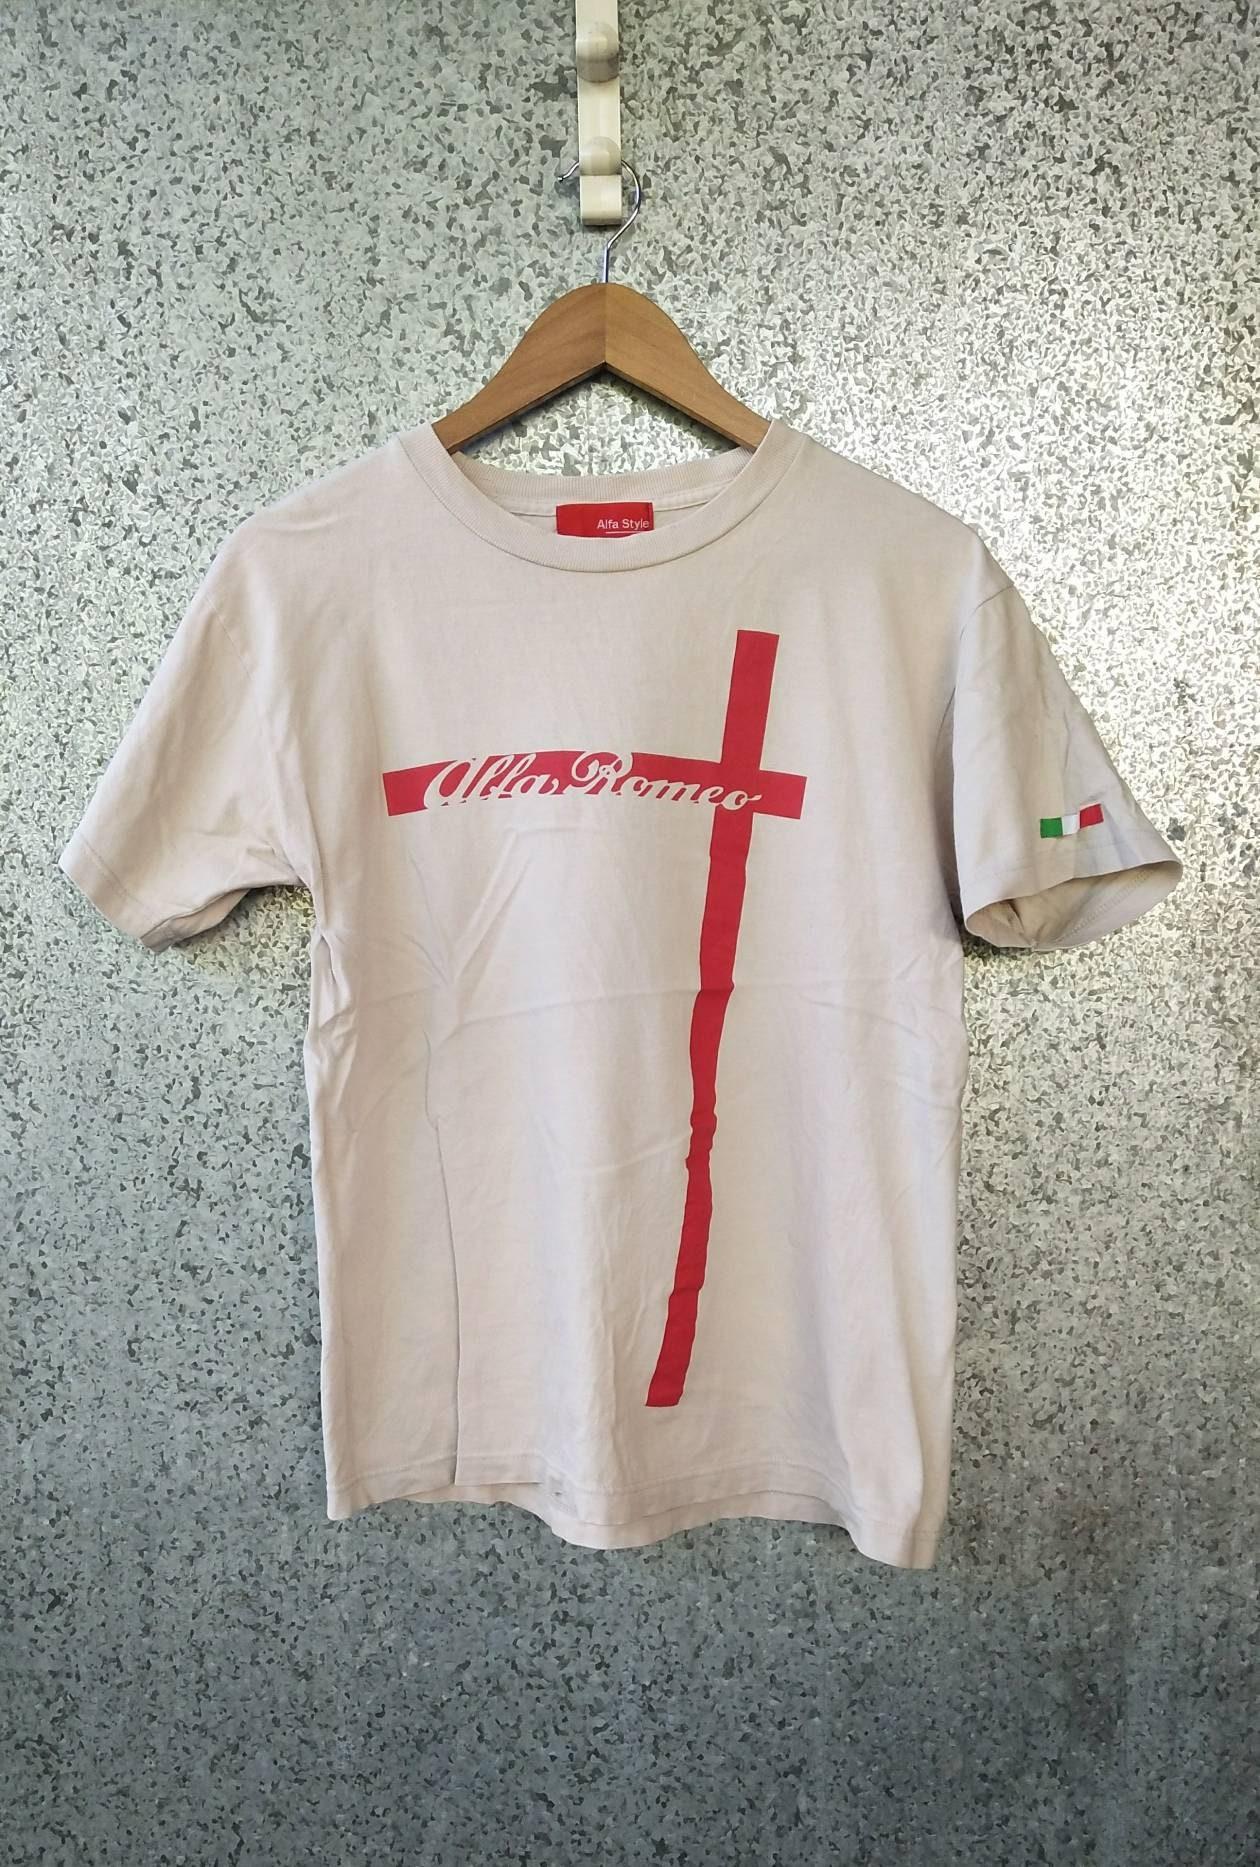 Vintage Alfa Romeo T Shirt Style Etsy Sweatshirt Zoom